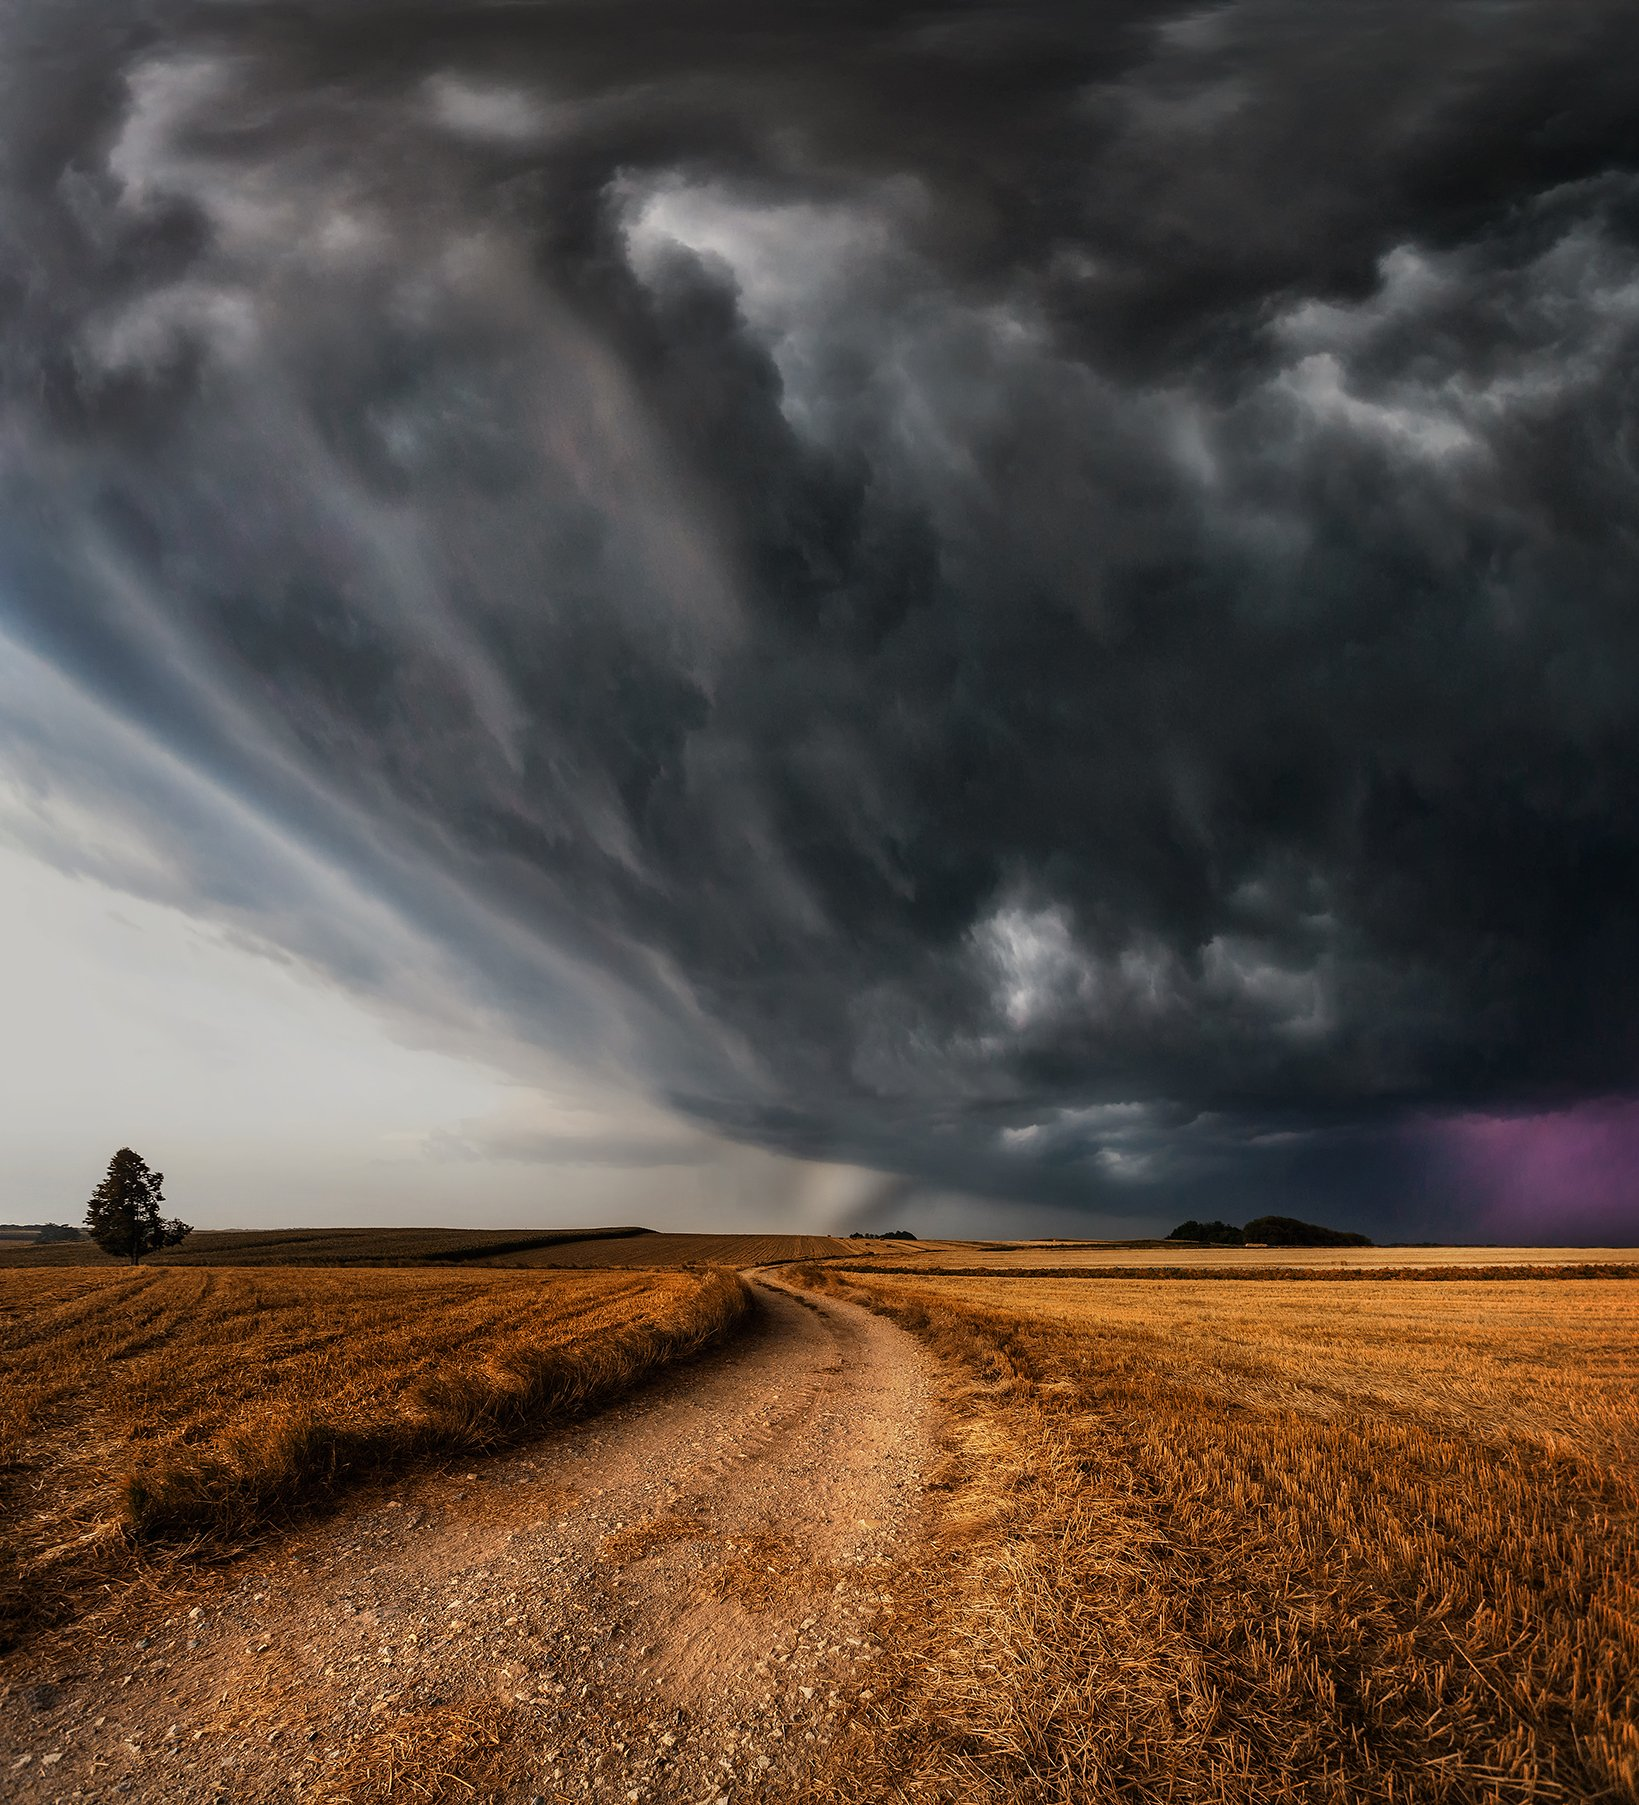 storm, field, fields, Poland, clouds, thunder, wind, summer, , Patrycja